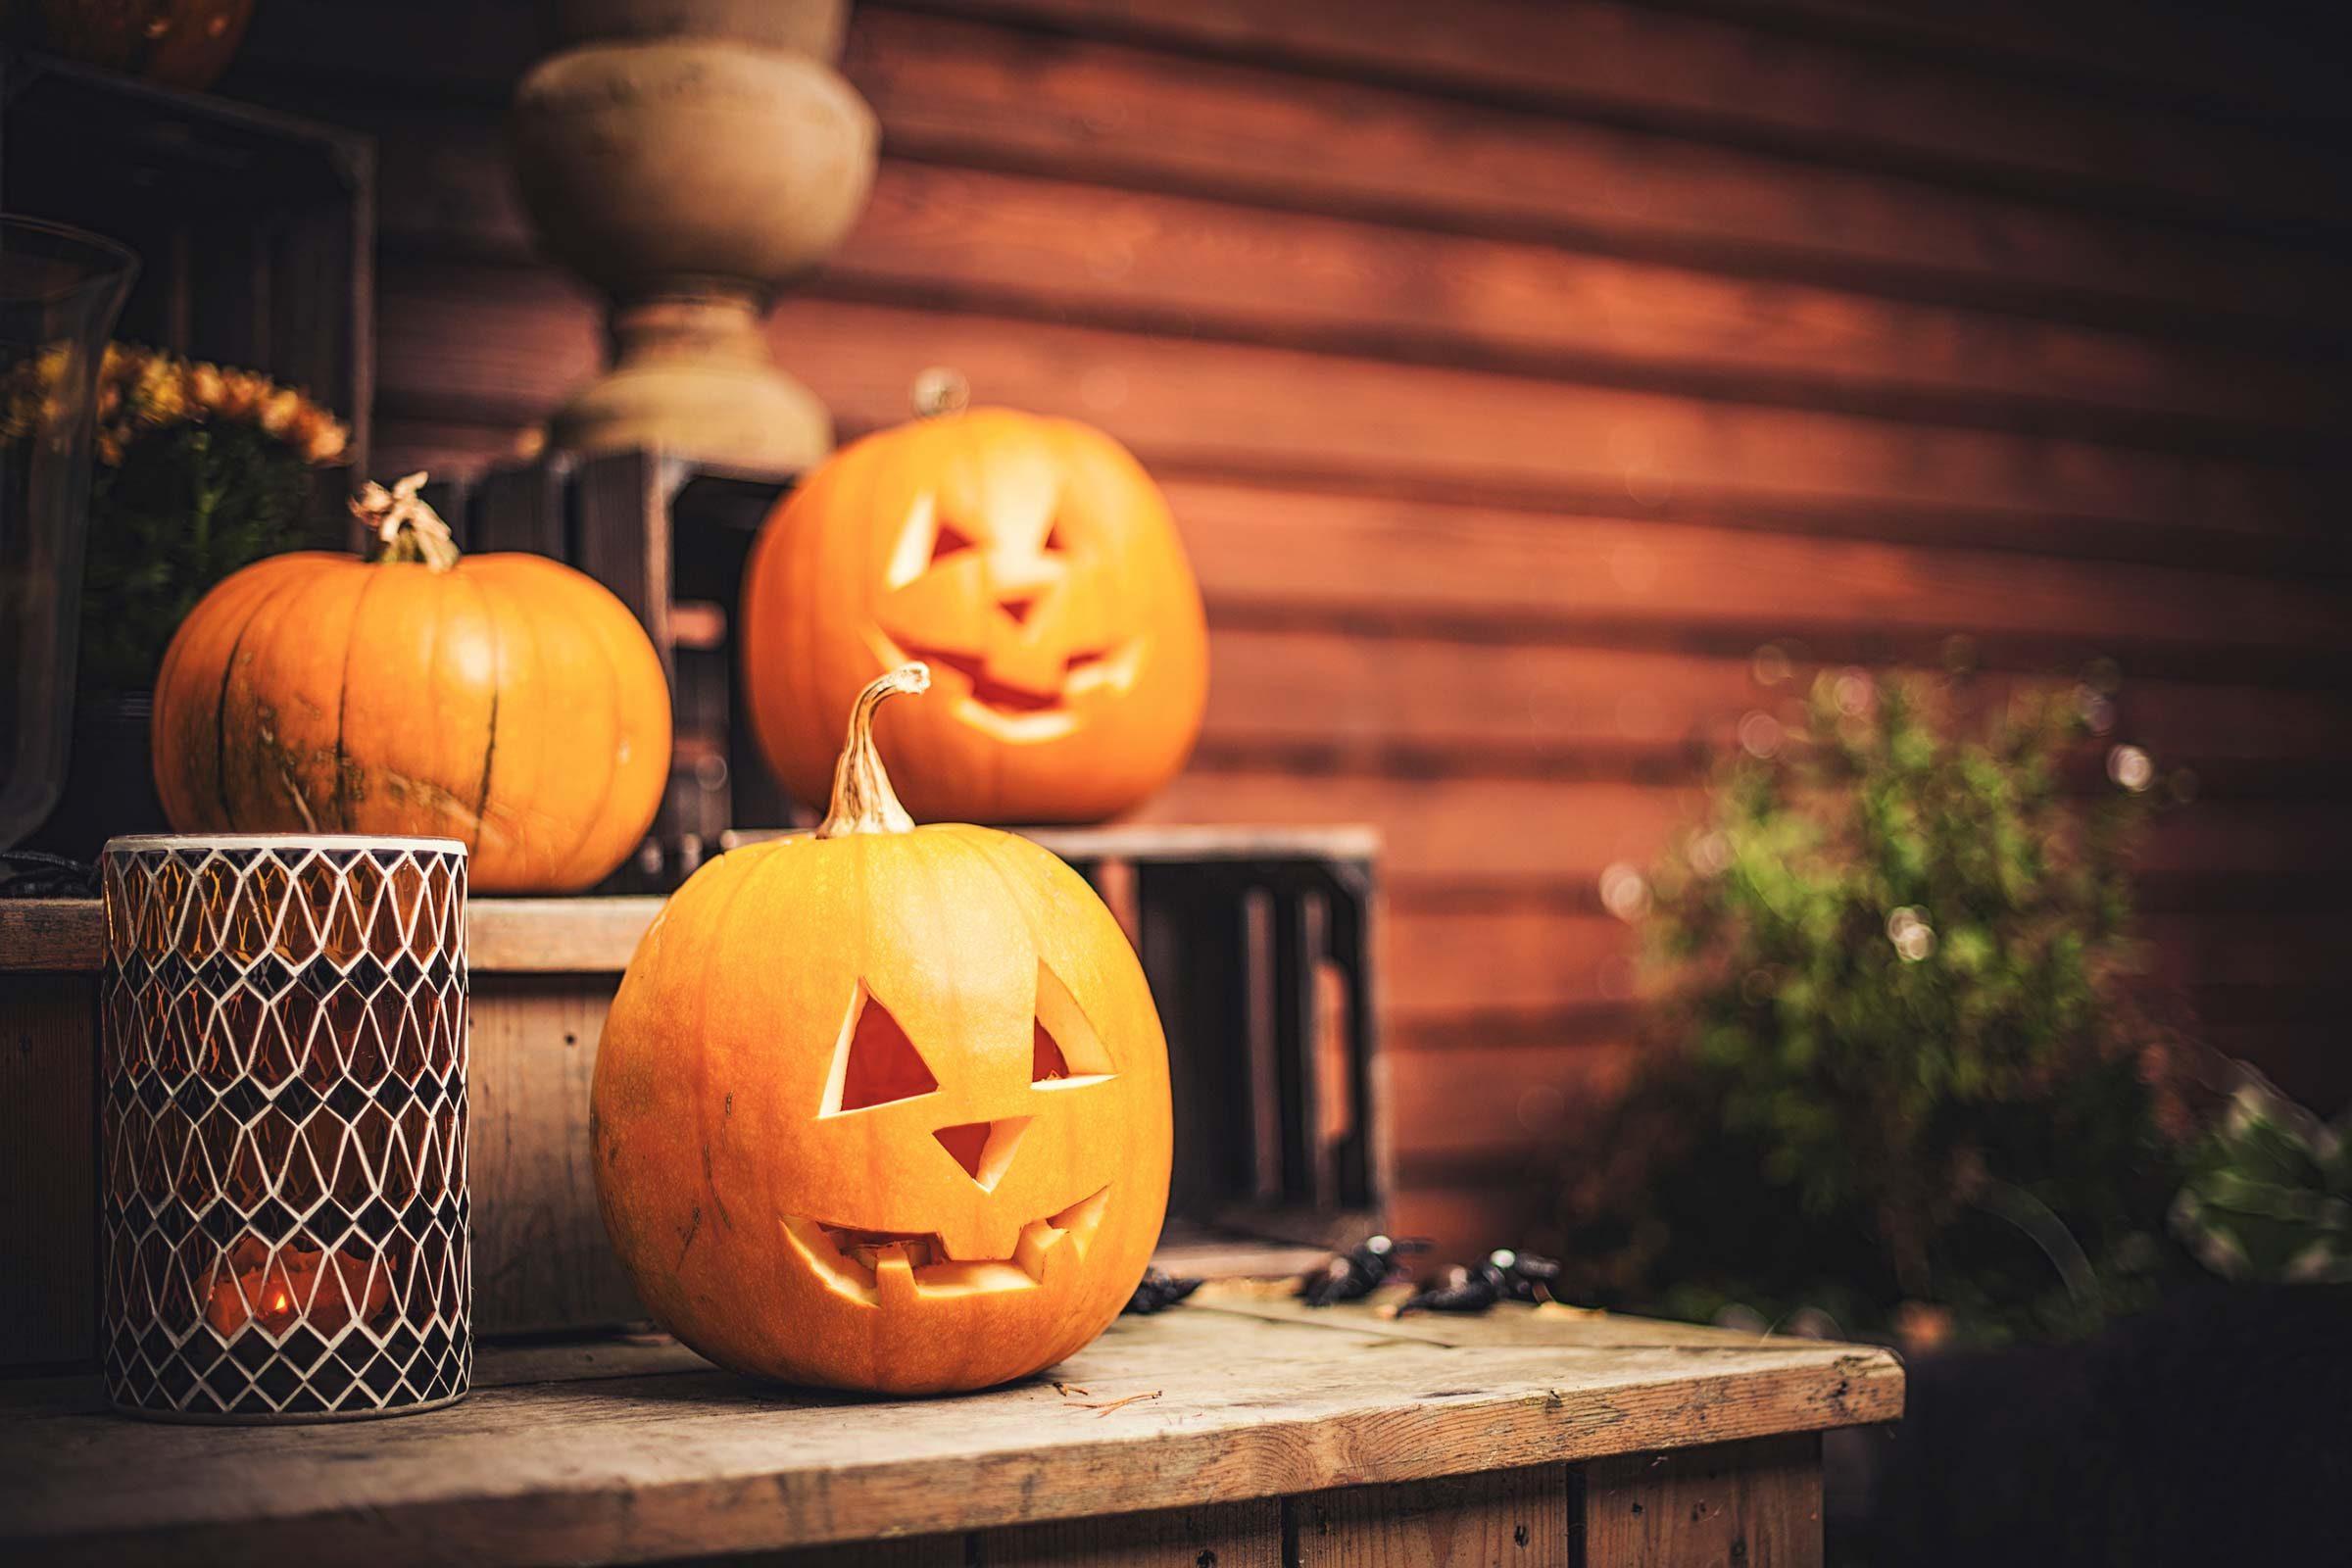 make sure halloween decorations are dog safe